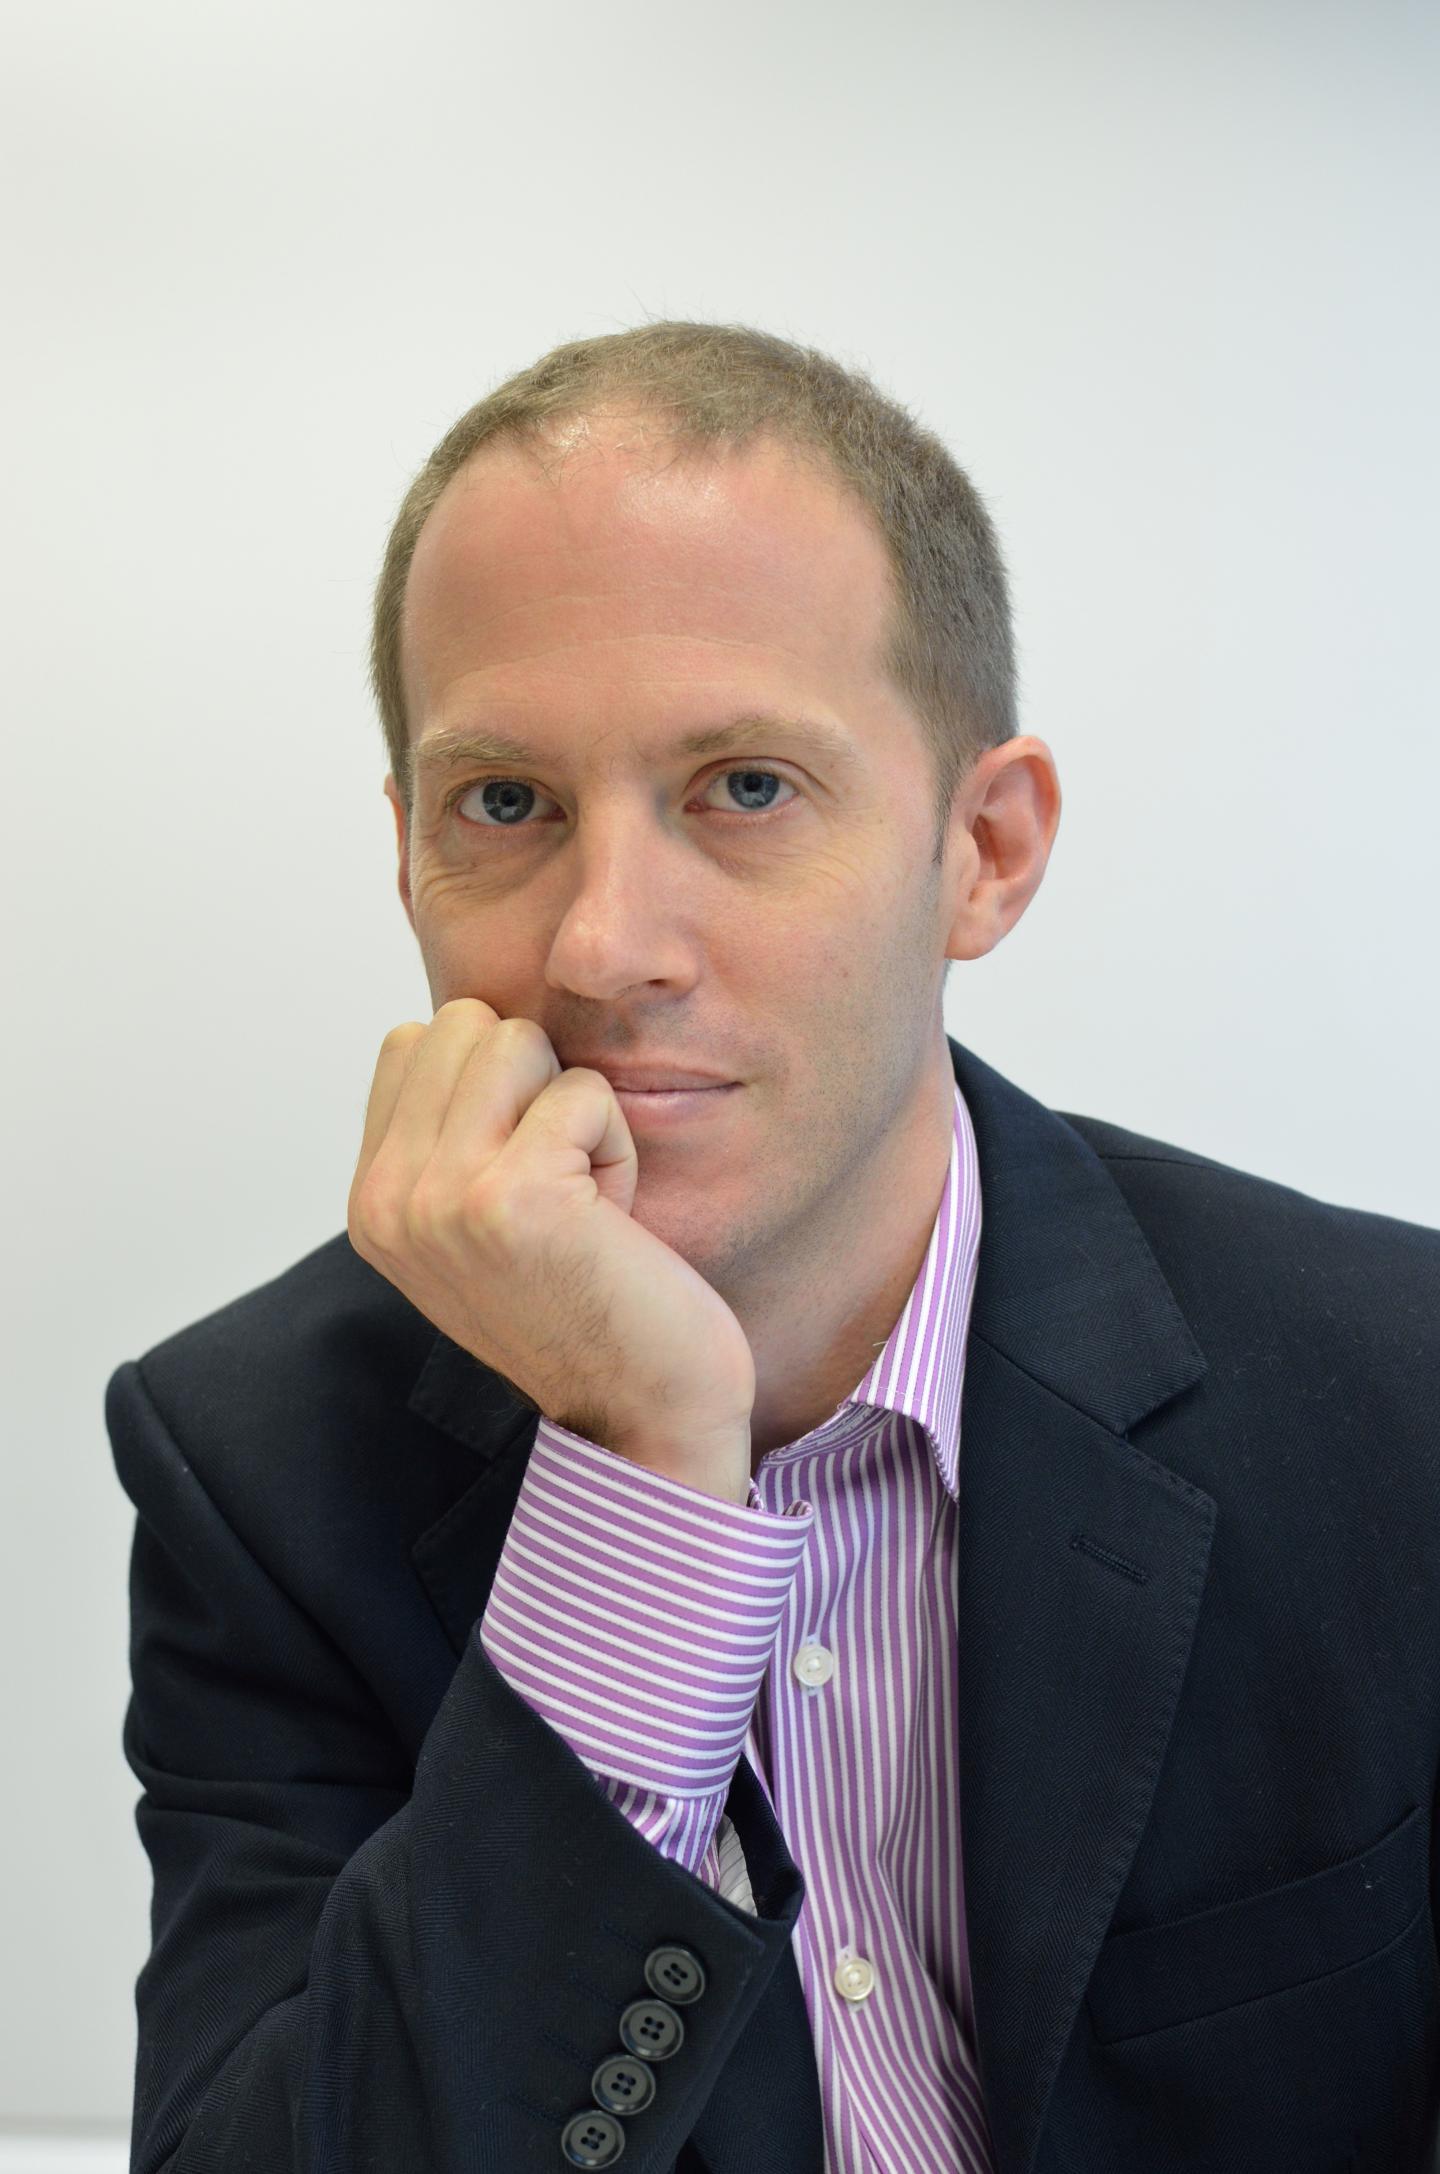 Ian Craddock, University of Bristol